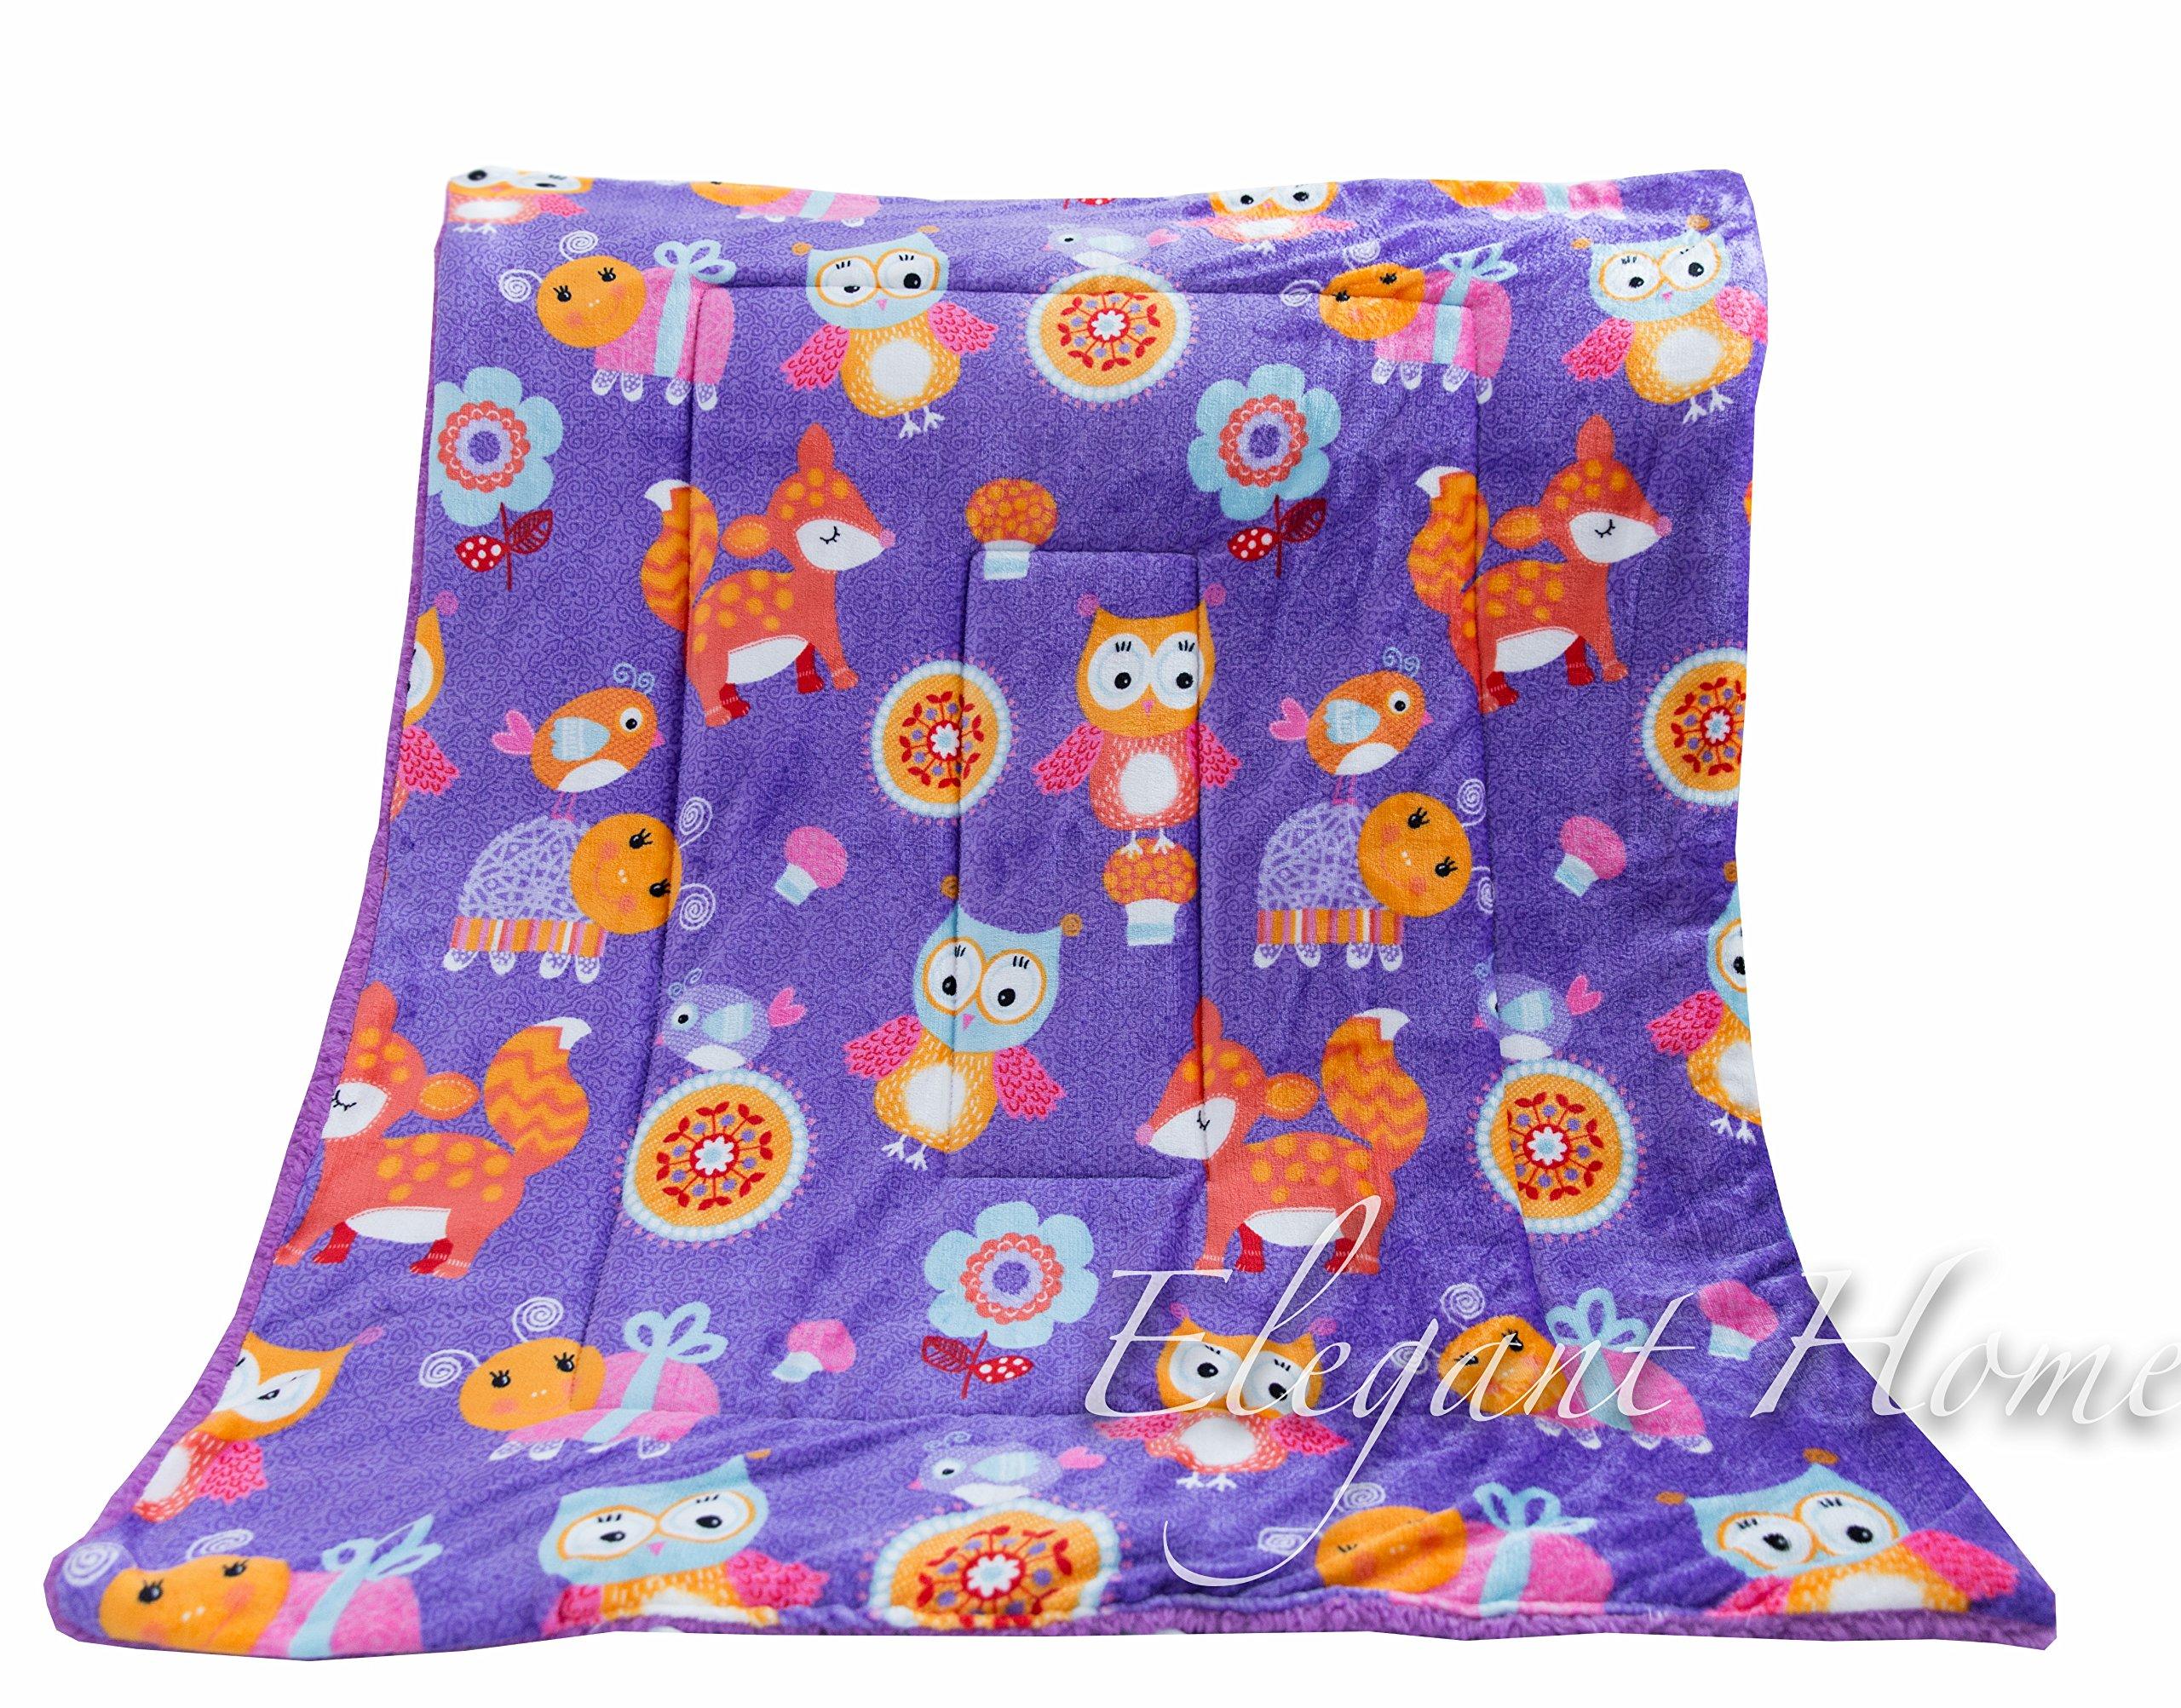 Elegant Home Kids Soft & Warm Sherpa Baby Toddler Girl Sherpa Blanket Purple Owls Birds Flowers Printed Borrego Stroller or Toddler Bed Blanket Plush Throw 40X50 # Owl